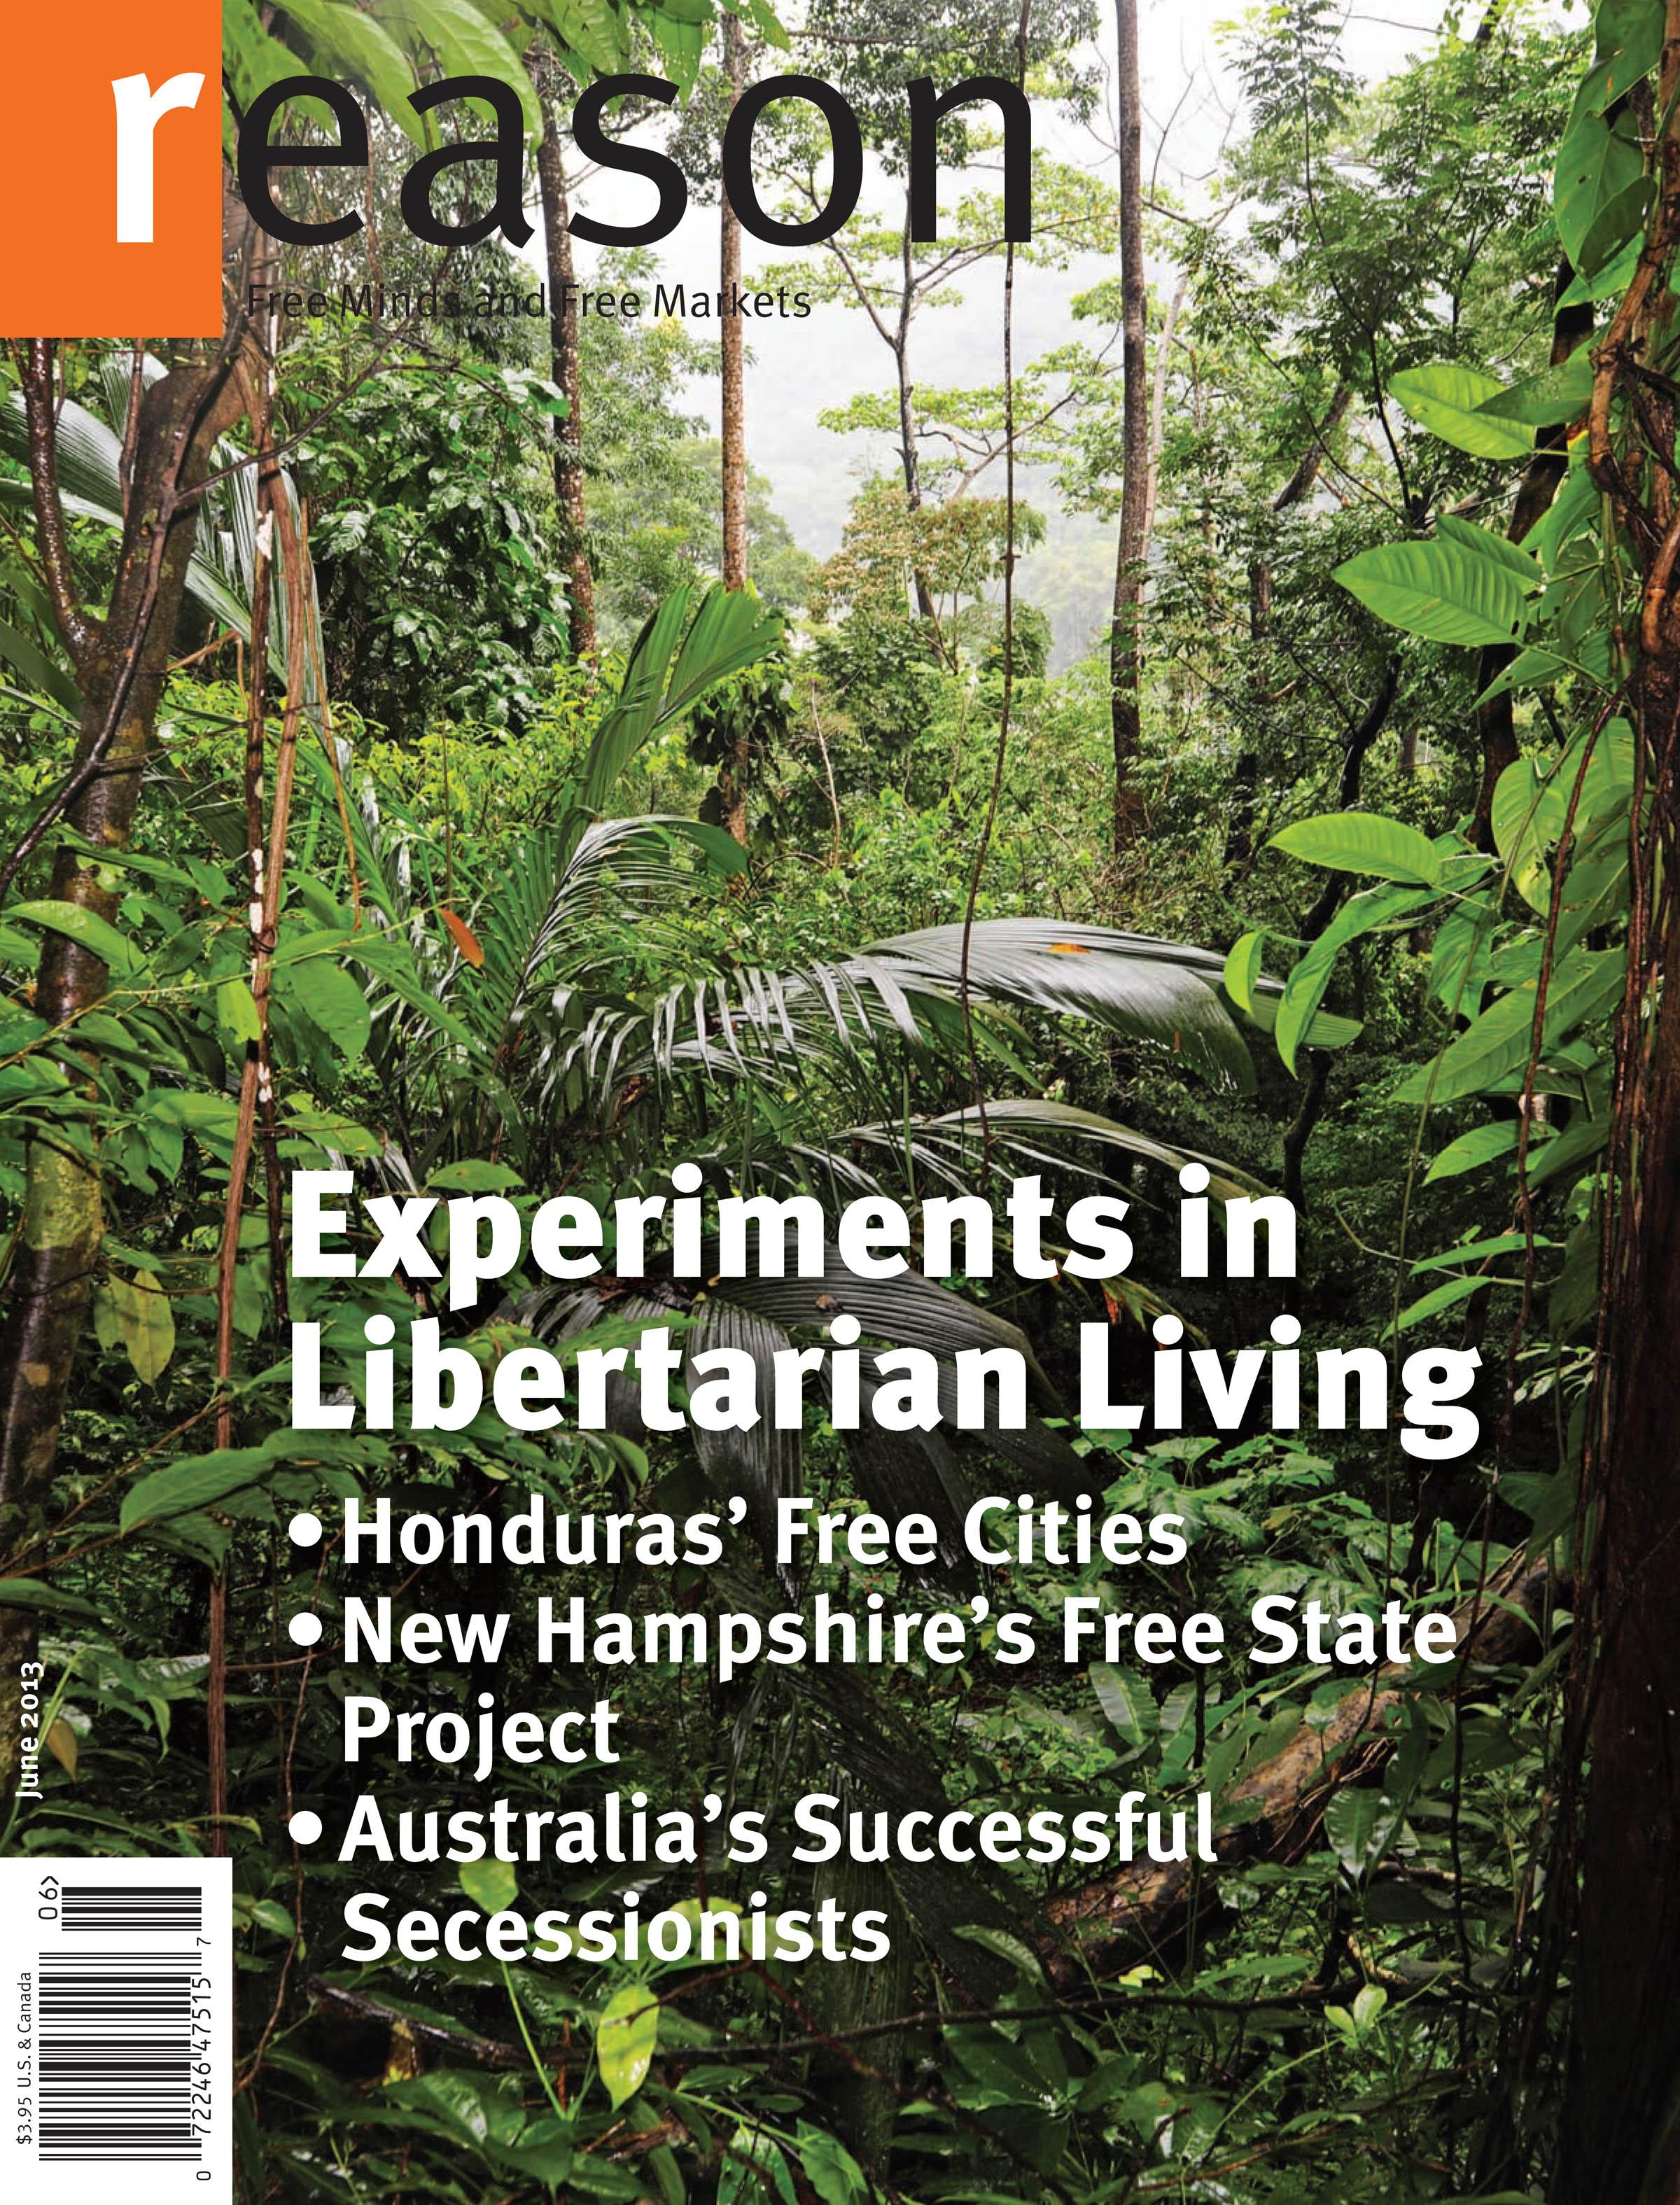 Reason Magazine, June 2013 cover image